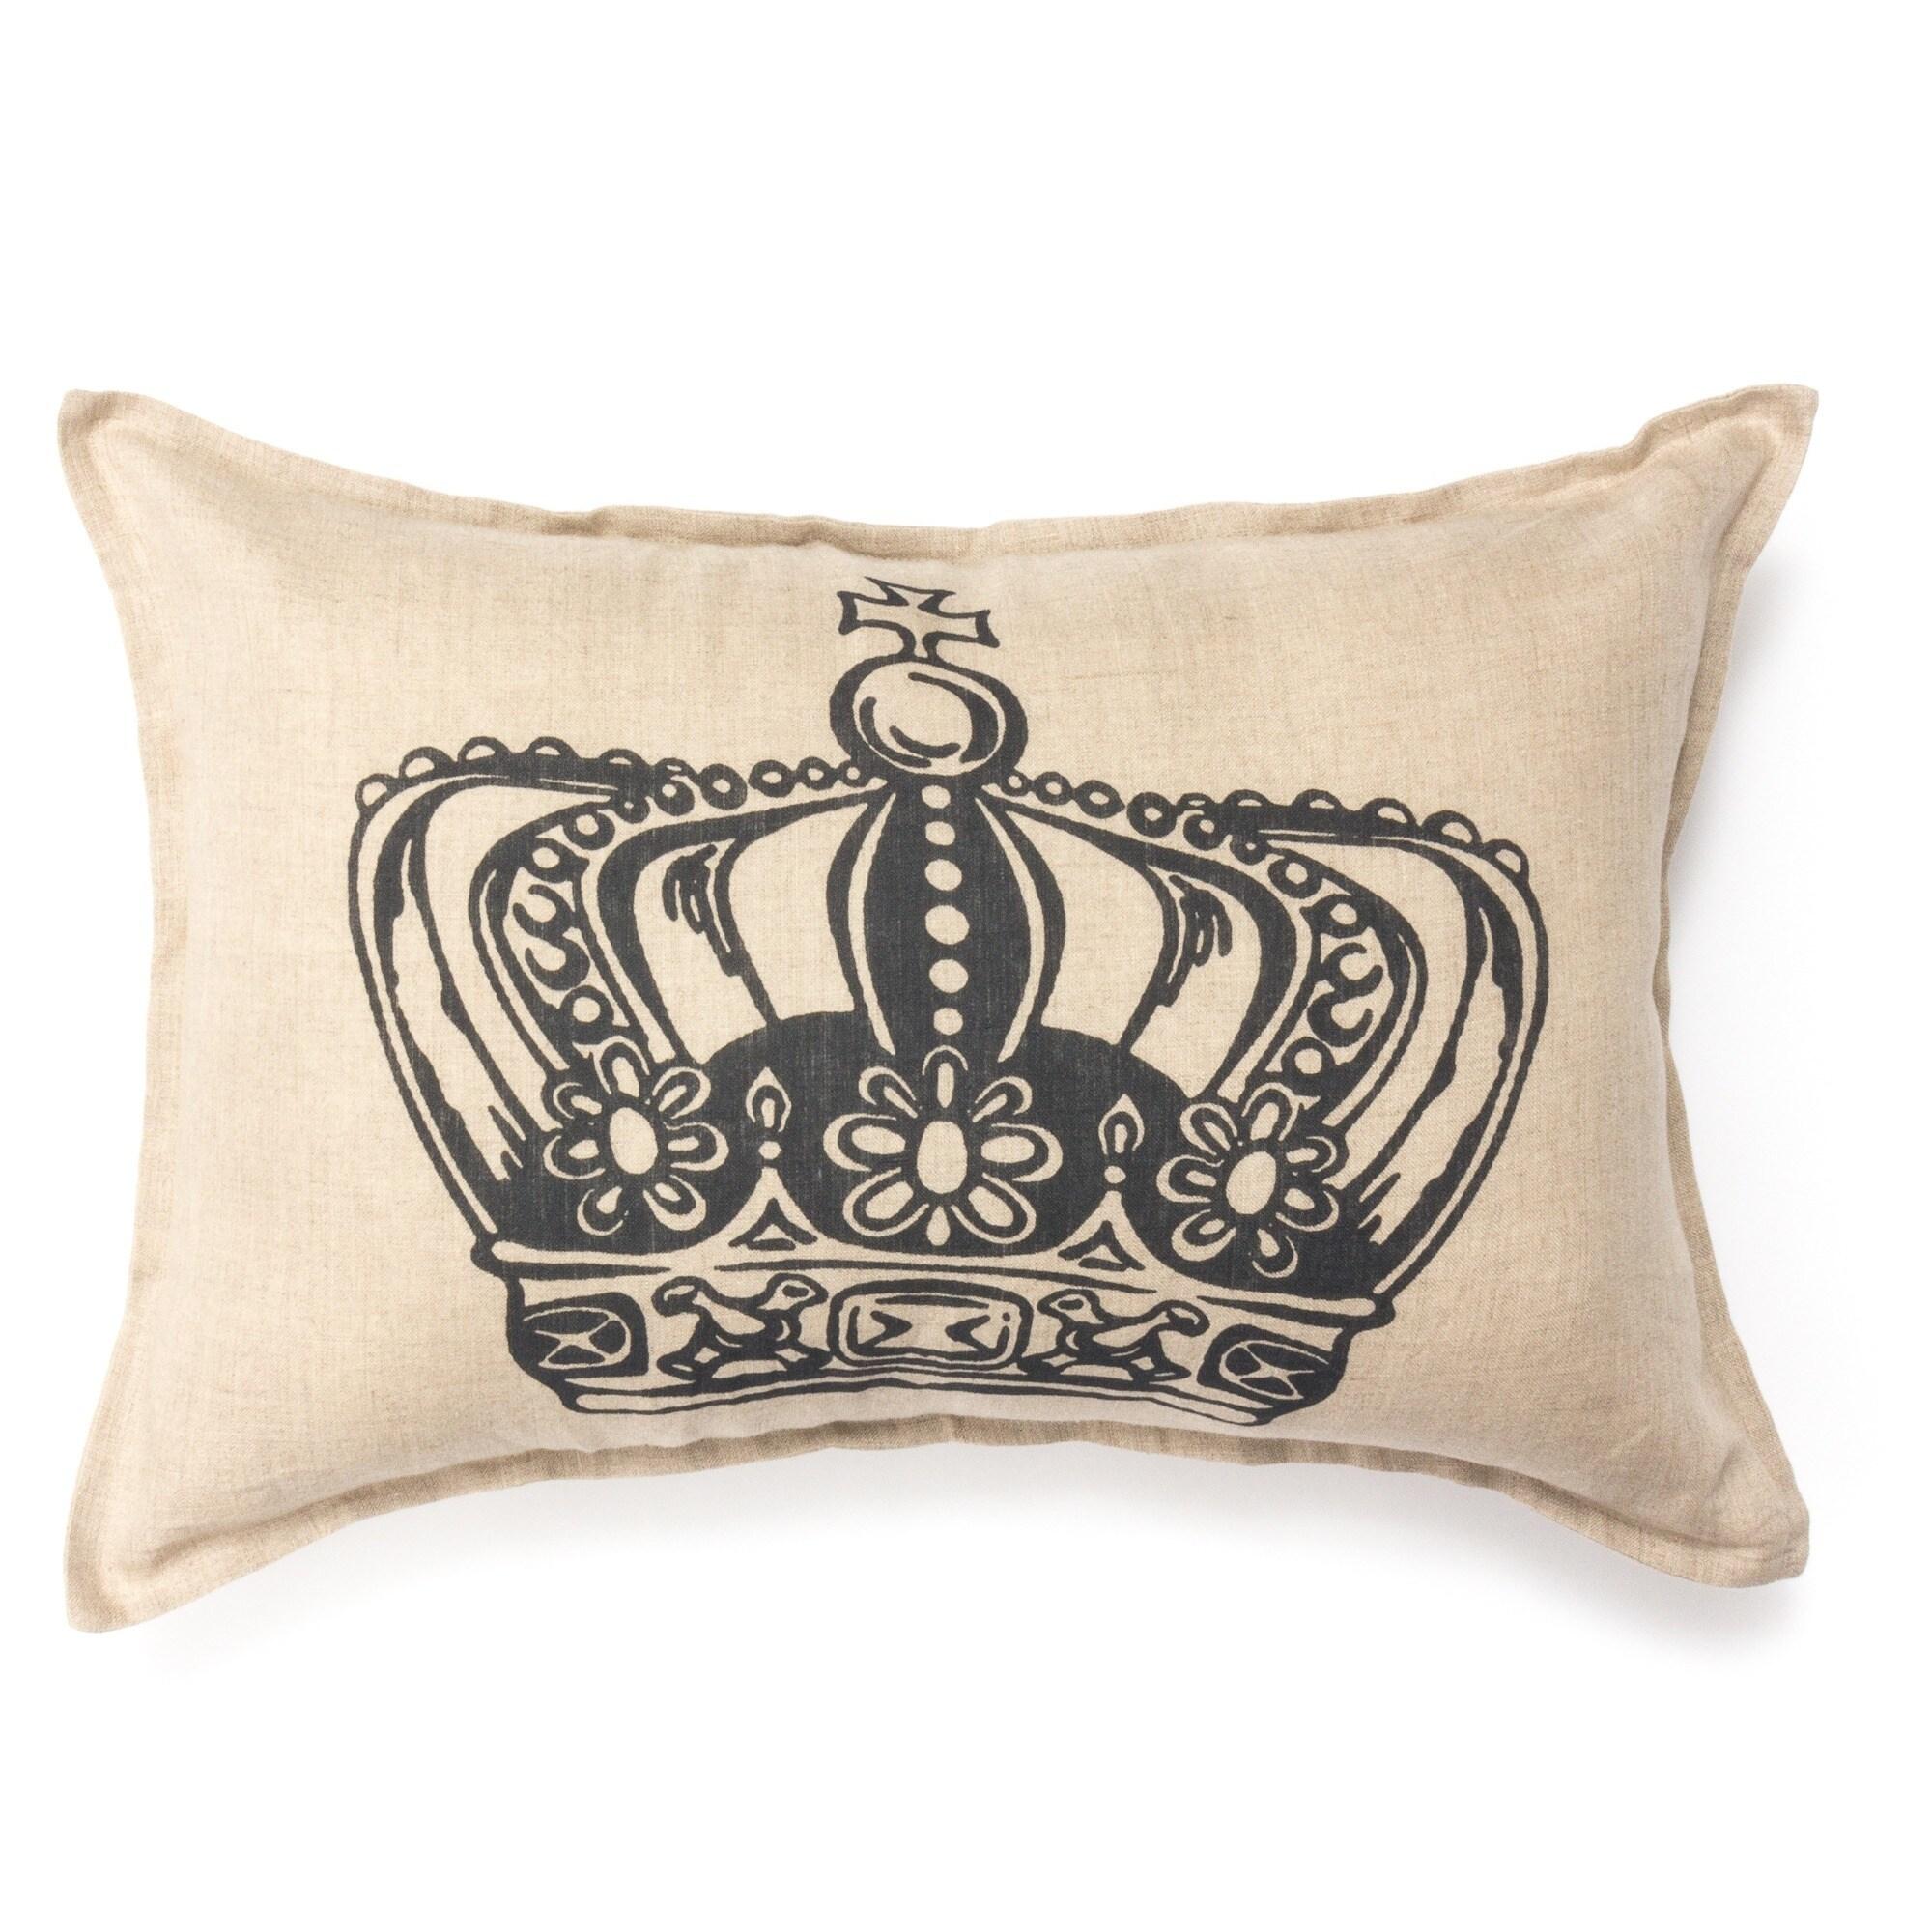 Cottage Home King Crown Bolster Pillow (Linen Pillow)